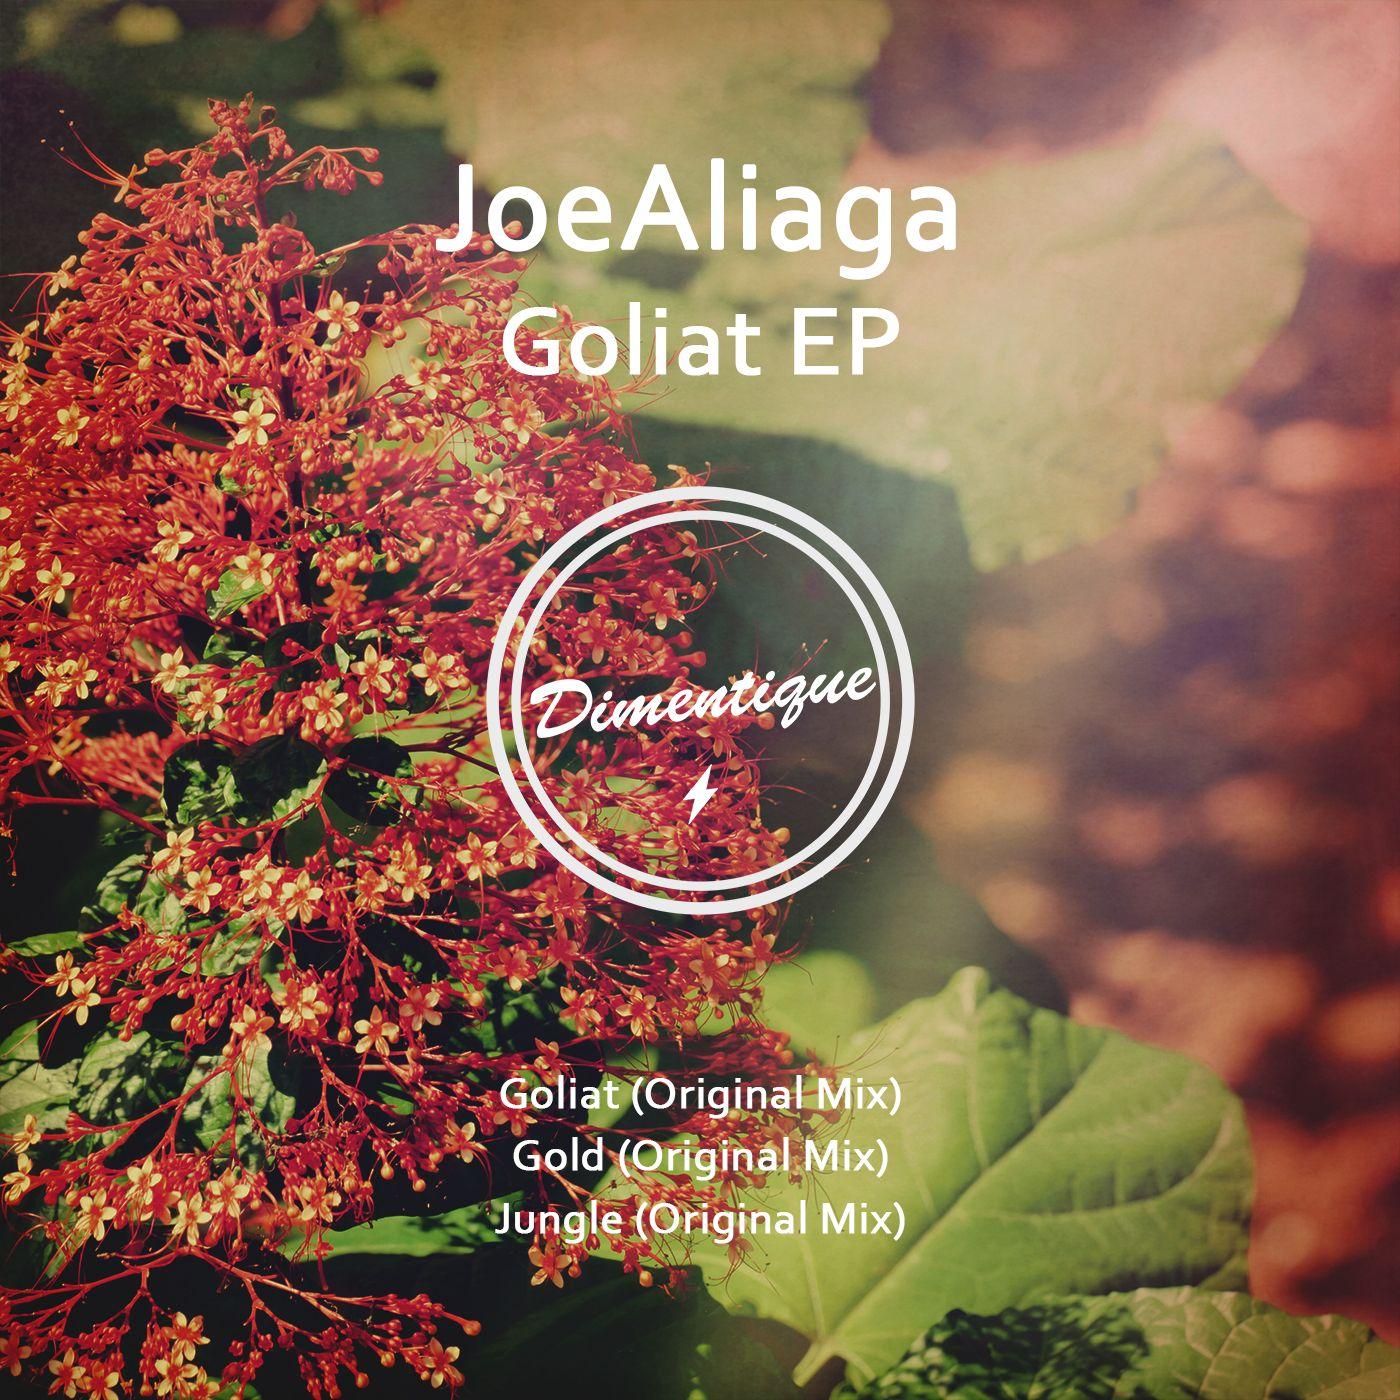 dimentique_new_art_2016_joealiaga_goliat_ep.jpg